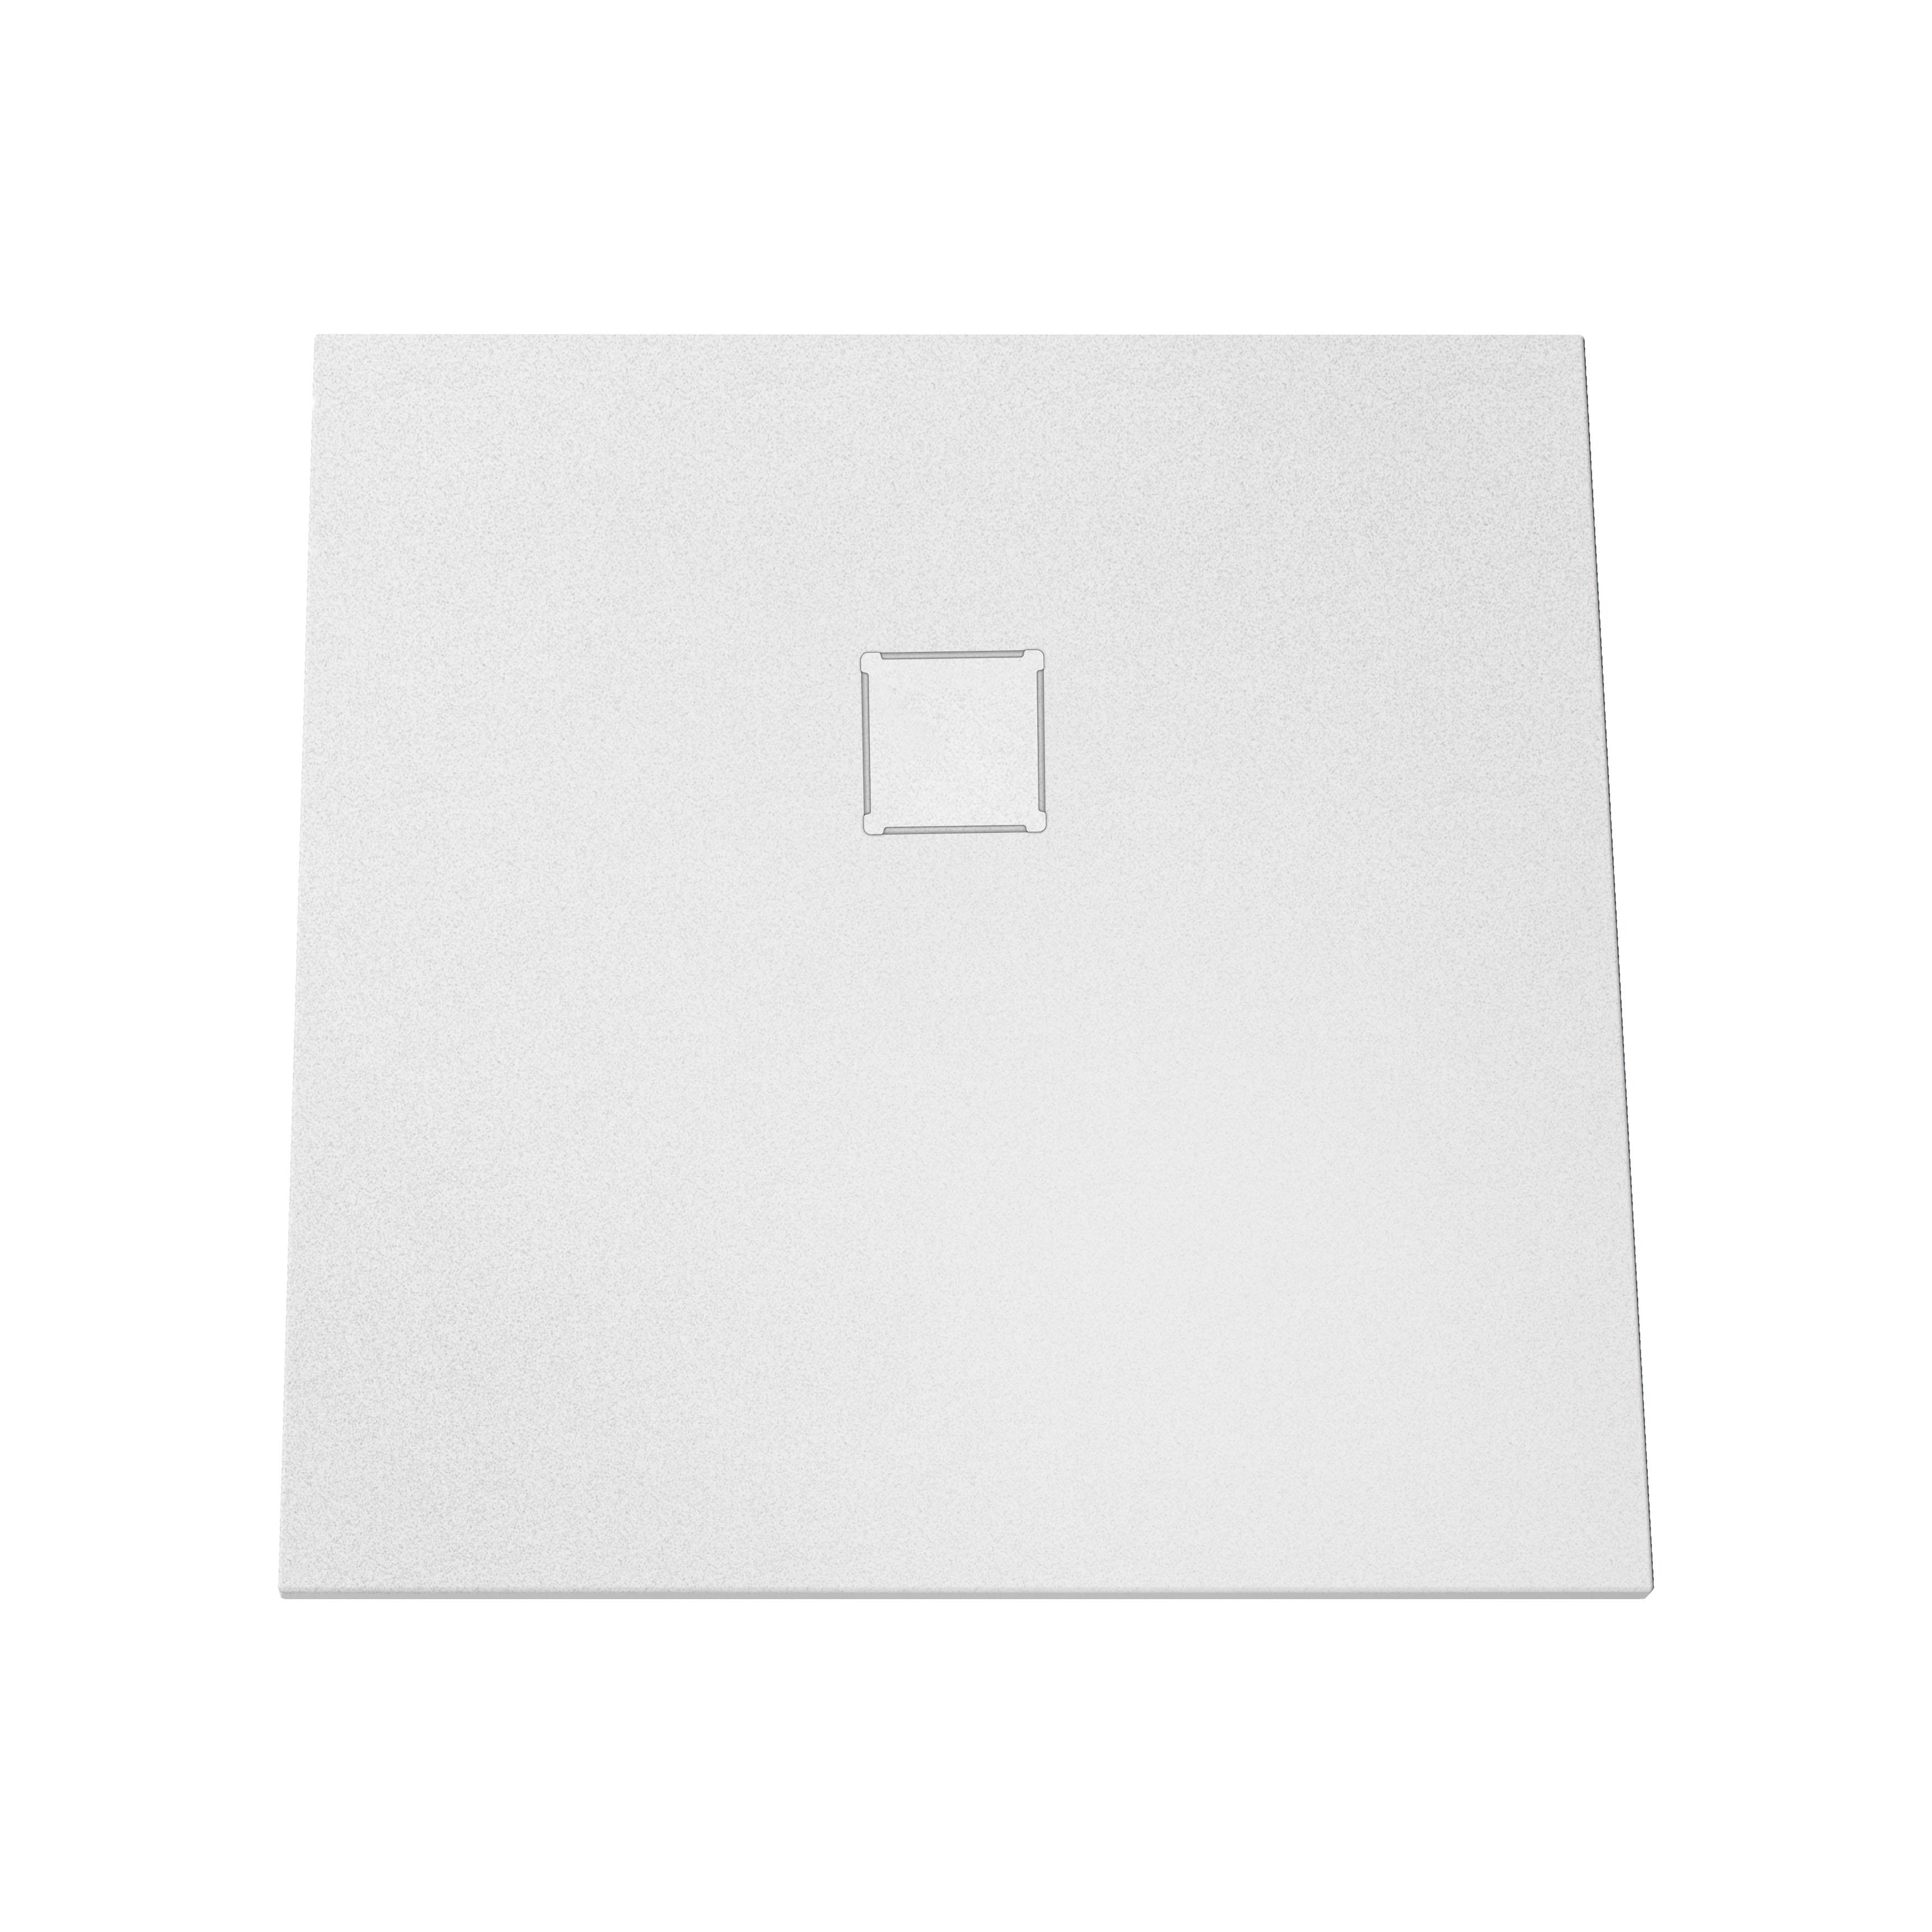 V-stone, receveur ultra plat en solid stone, 90 cm, blanc